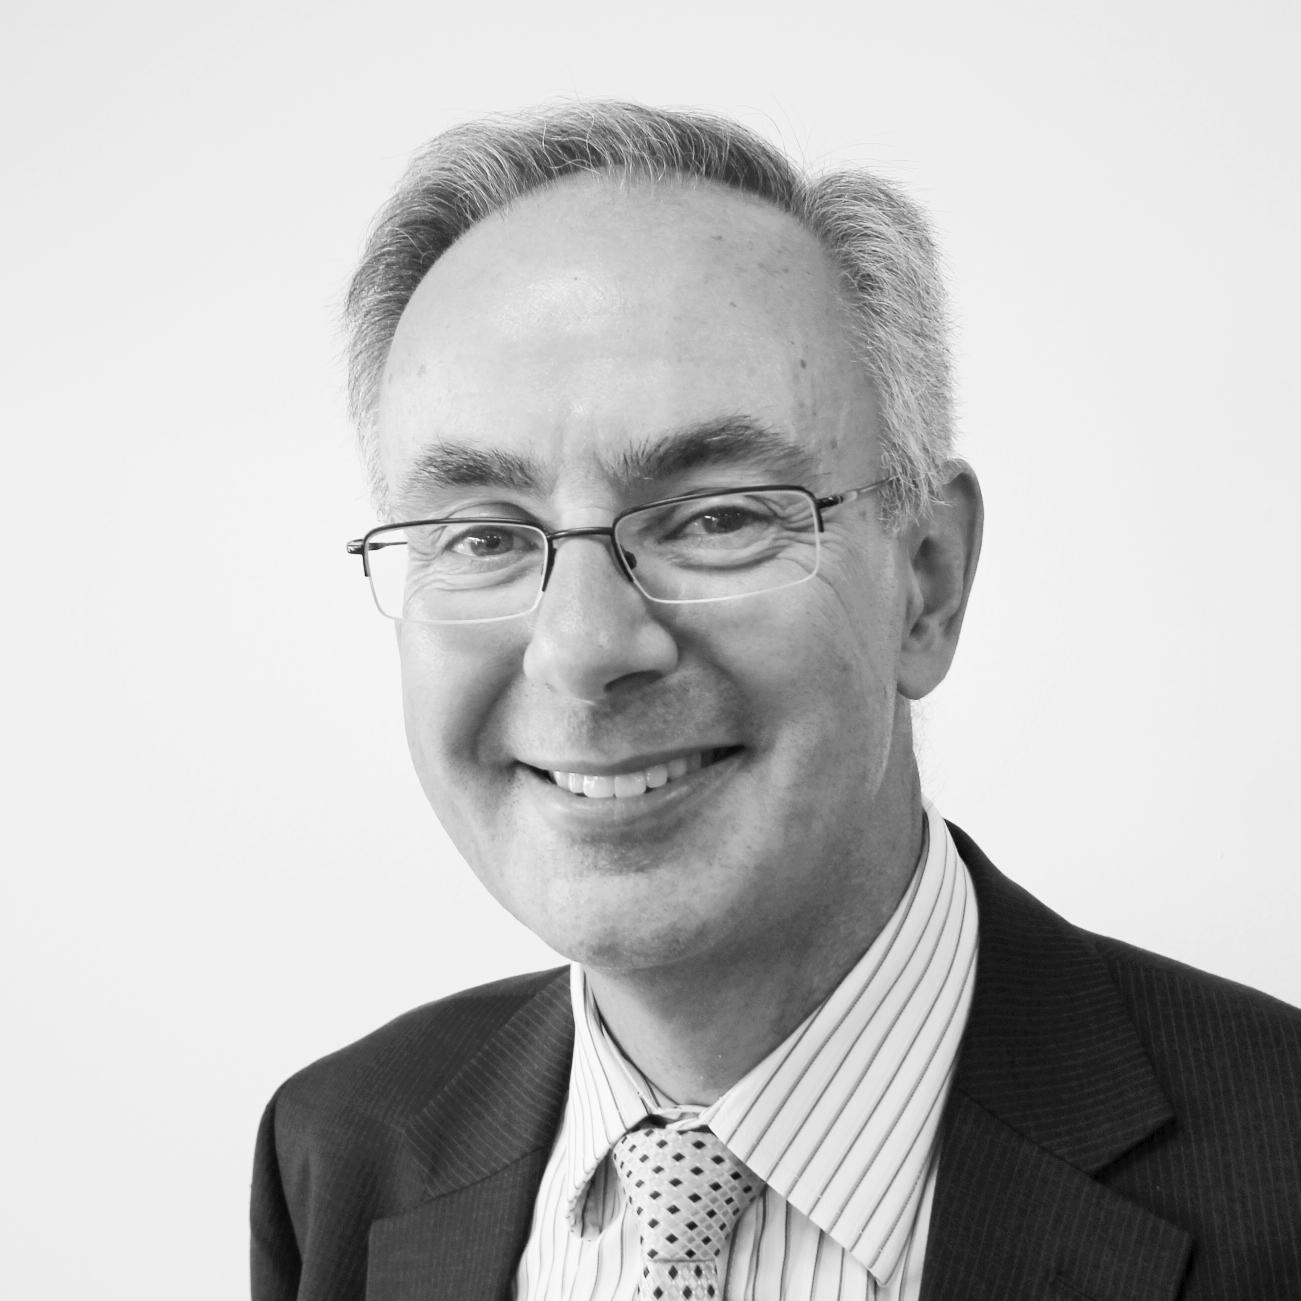 Andy Martin BSc (Hons) FRICS